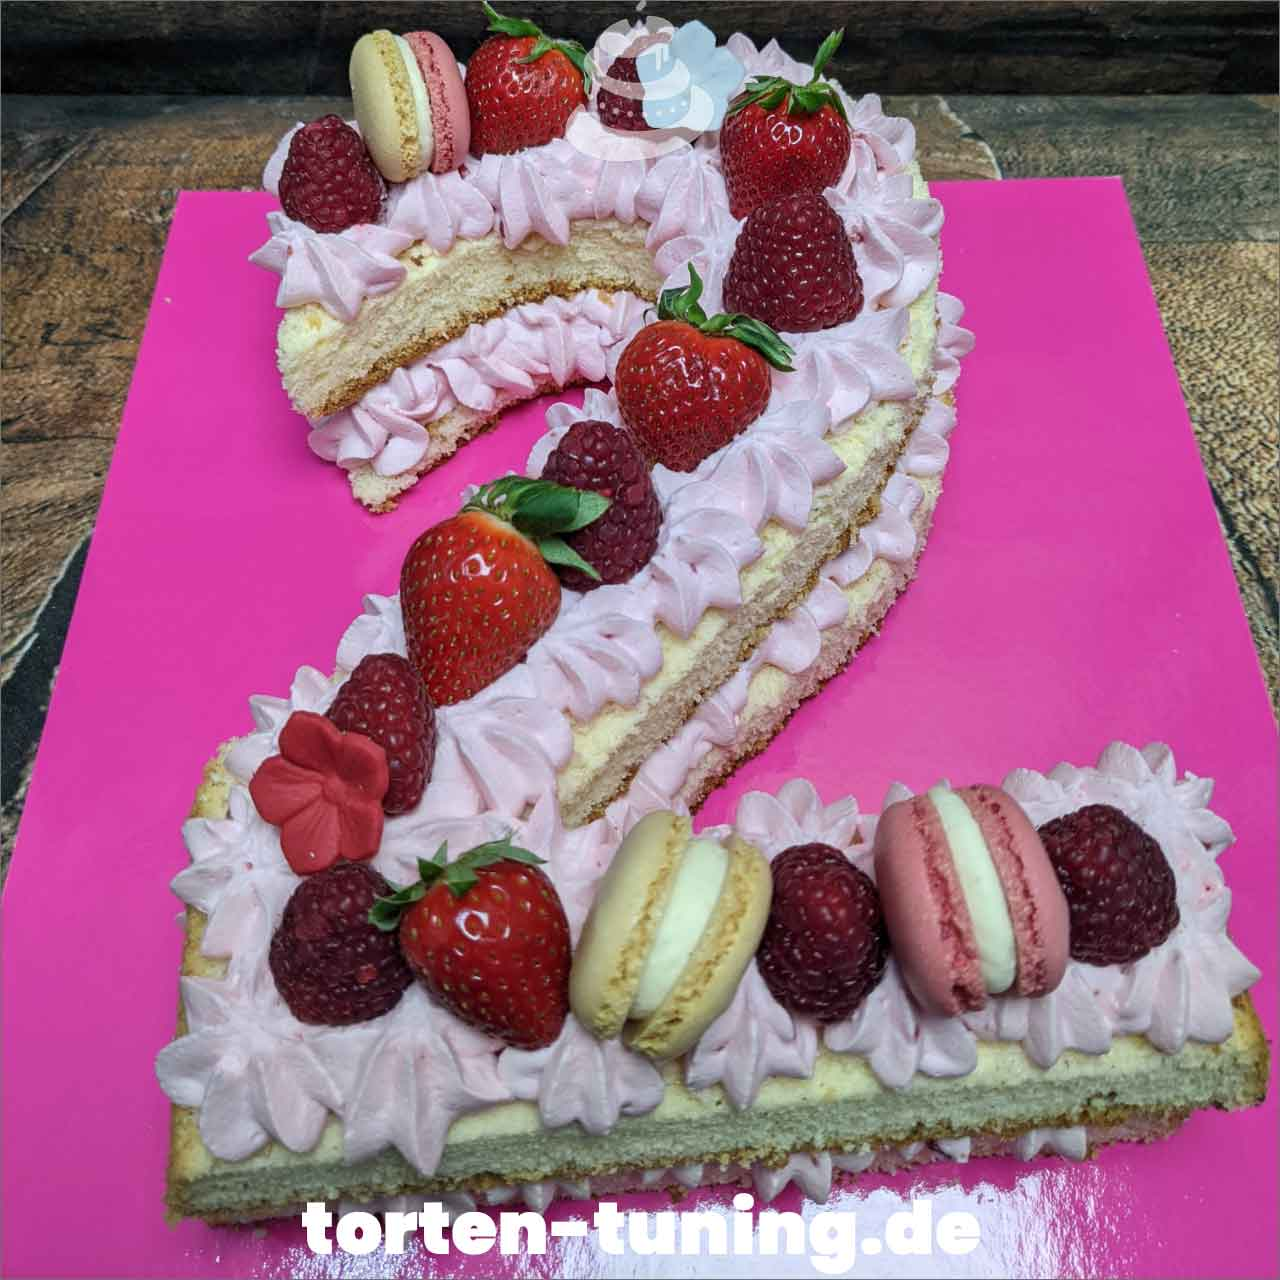 Numbercake Nakedcake 2 Dripcake Obsttorte Geburtstagstorte Motivtorte Torte Tortendekoration Torte online bestellen Suhl Thüringen Torten Tuning Sahnetorte Tortenfiguren Cake Topper